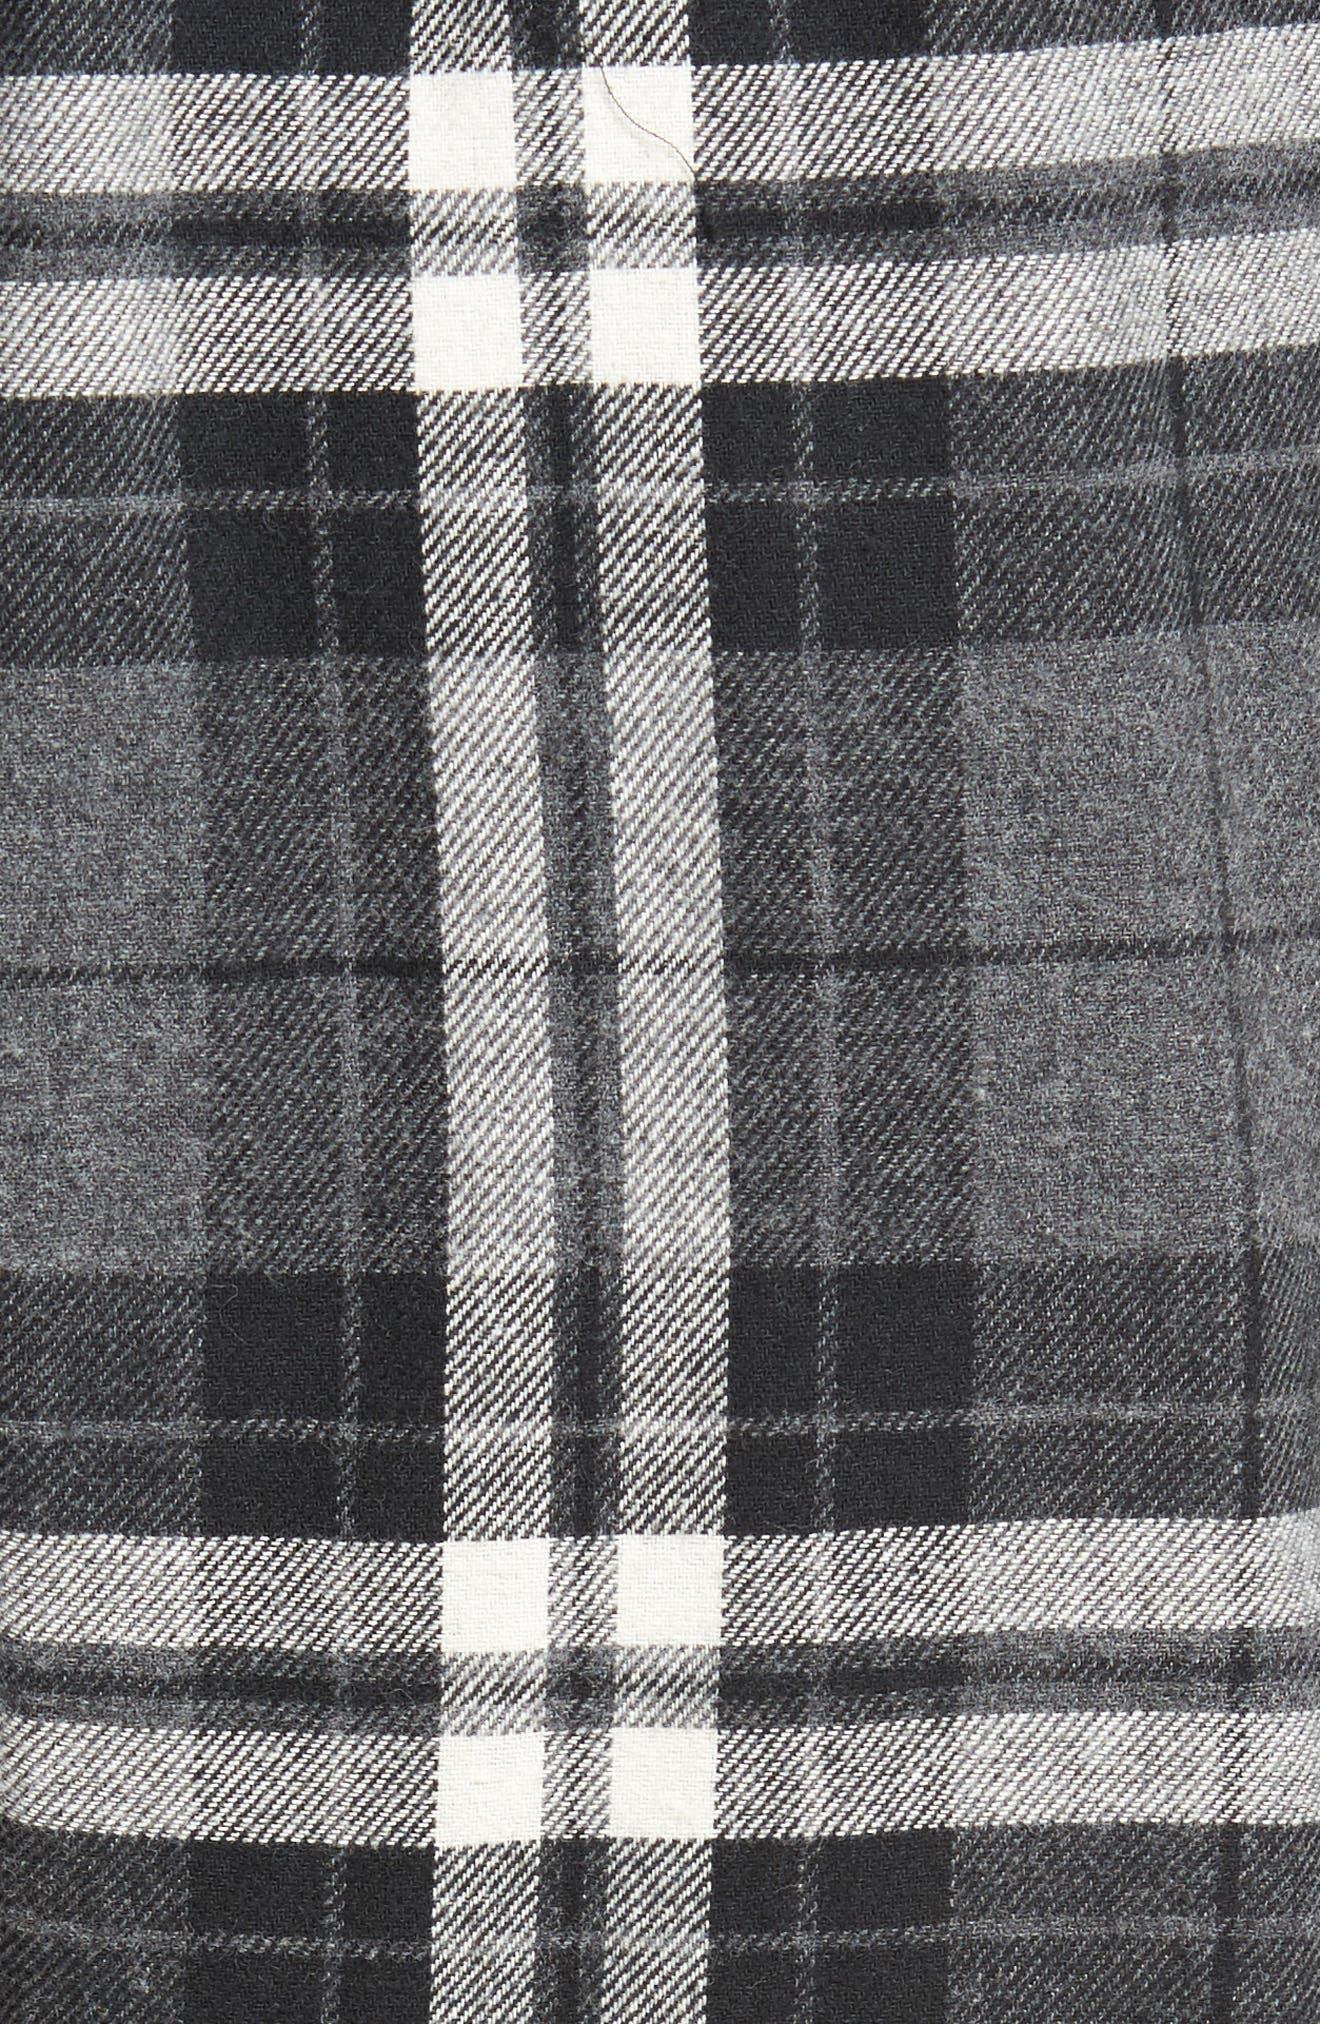 Flannel Pajama Jogger Pants,                             Alternate thumbnail 5, color,                             022